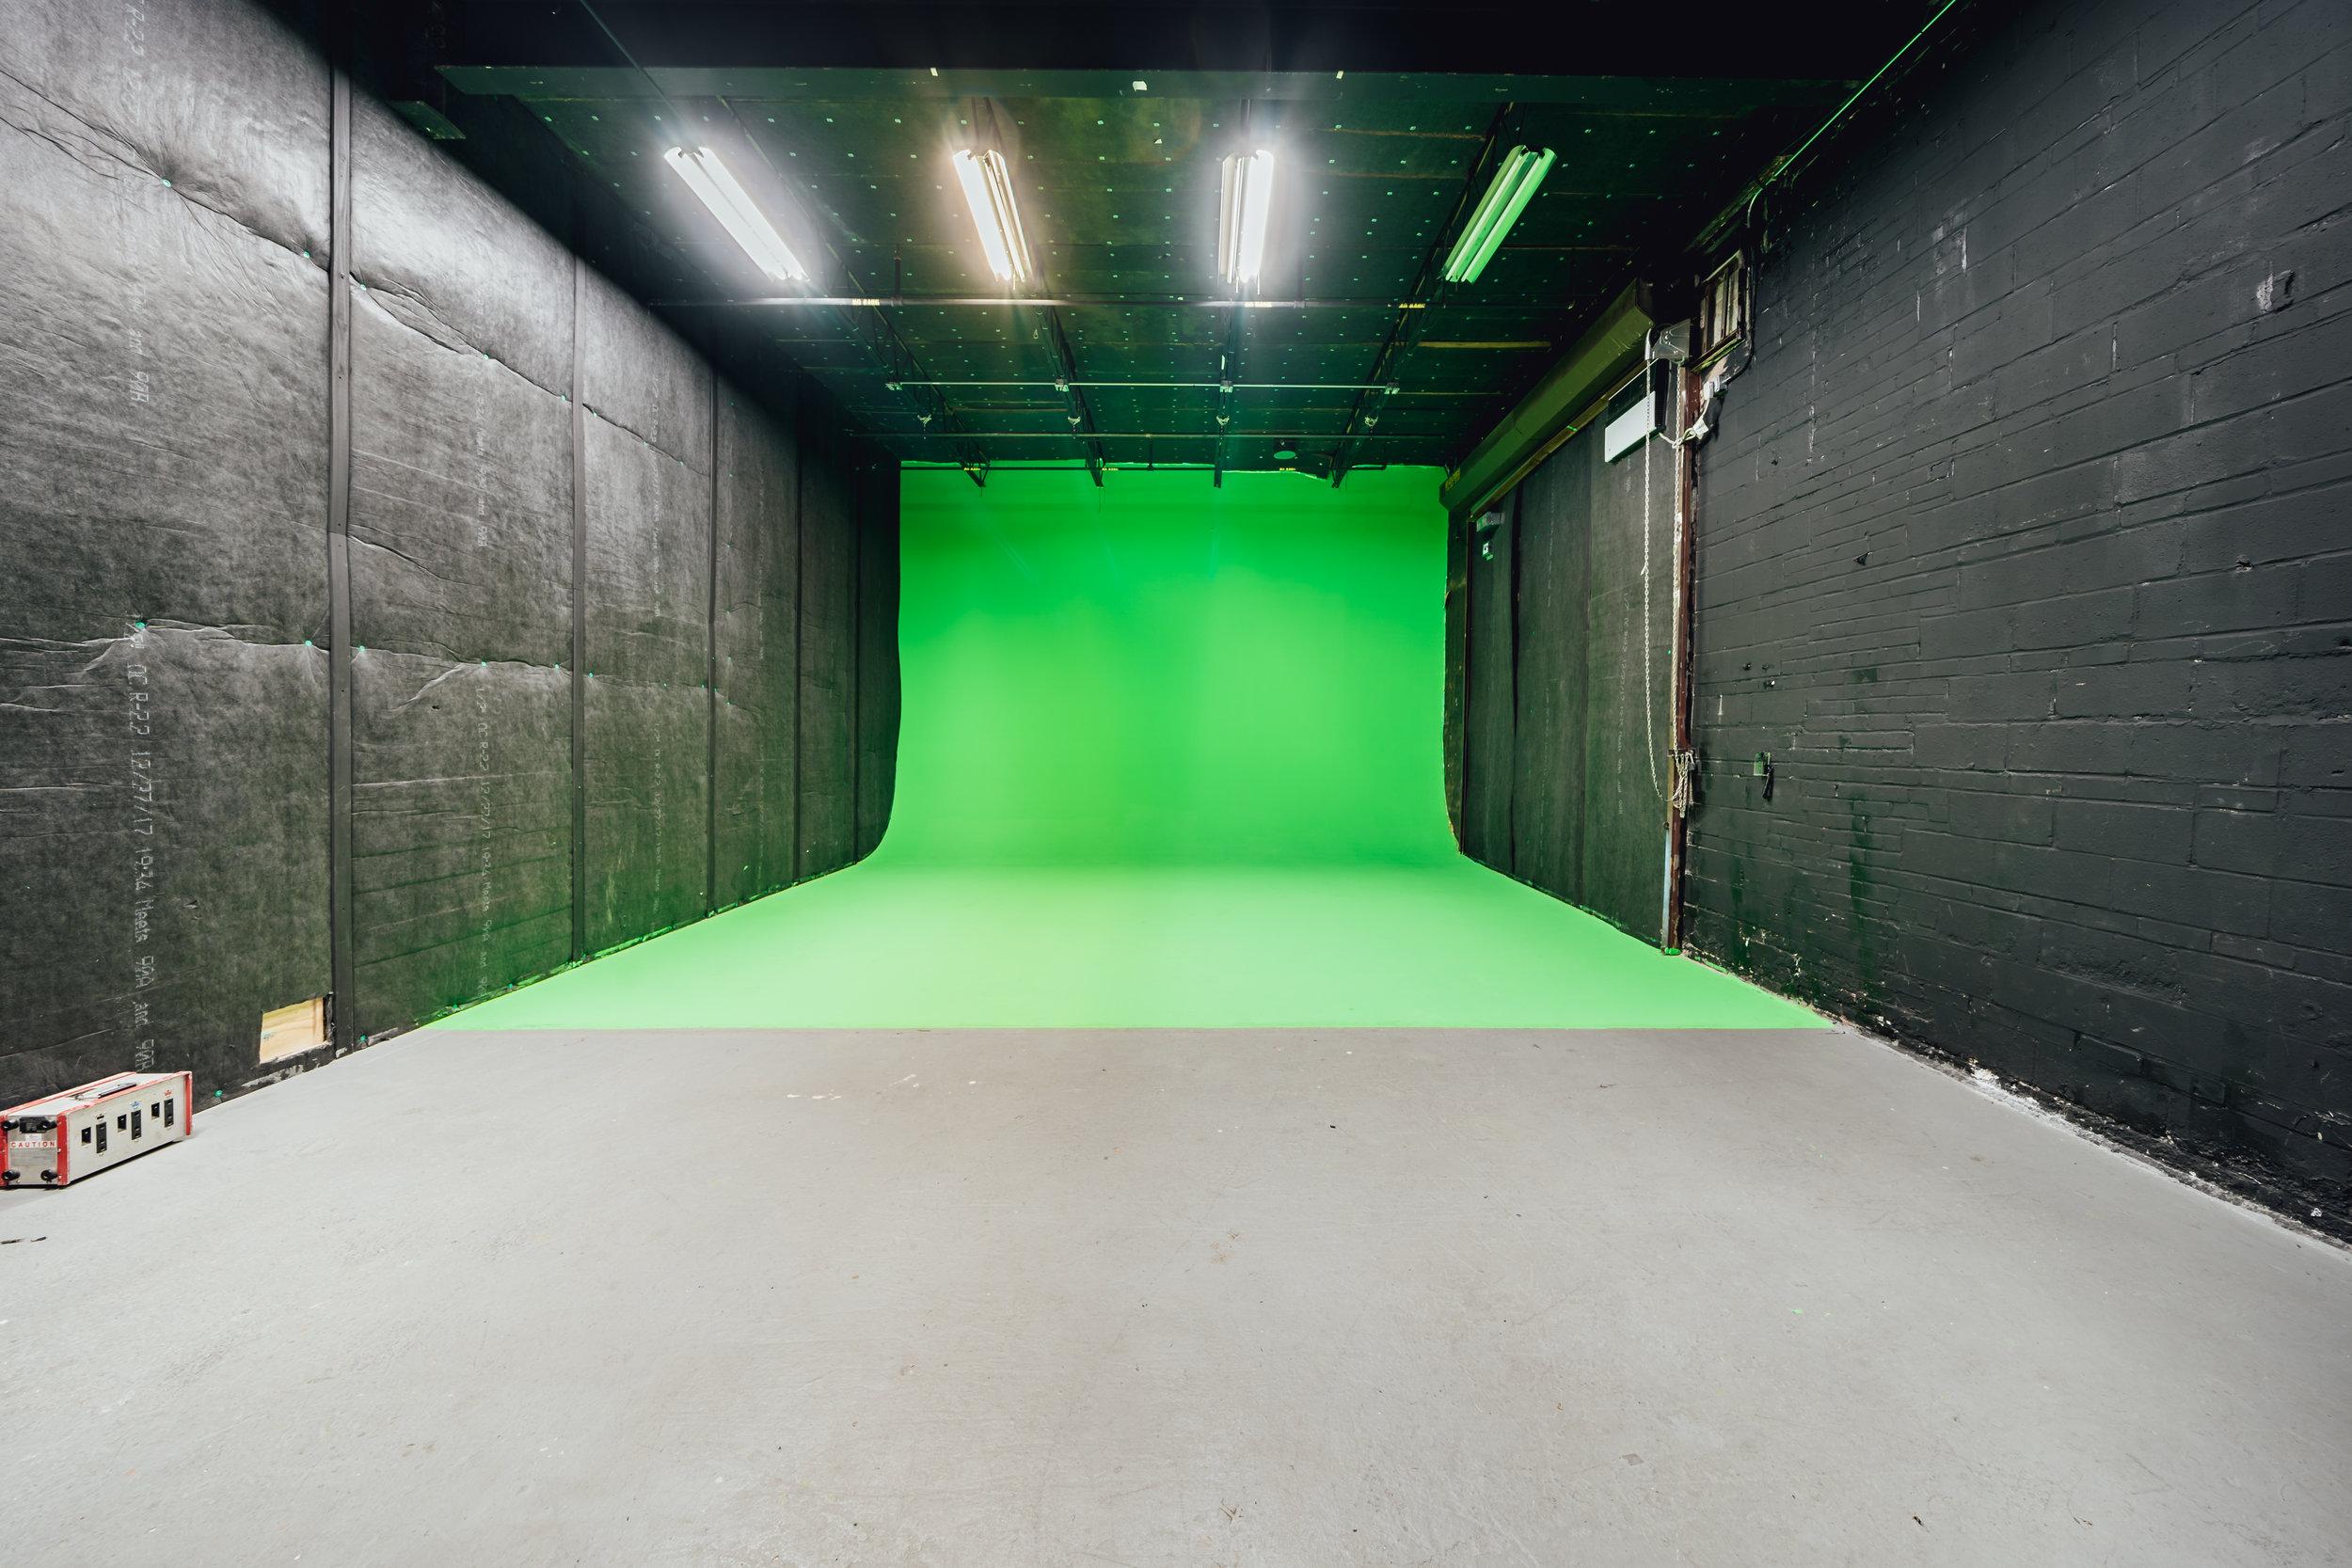 Studio 6: Green Cyc Stage - One Wall Cyc